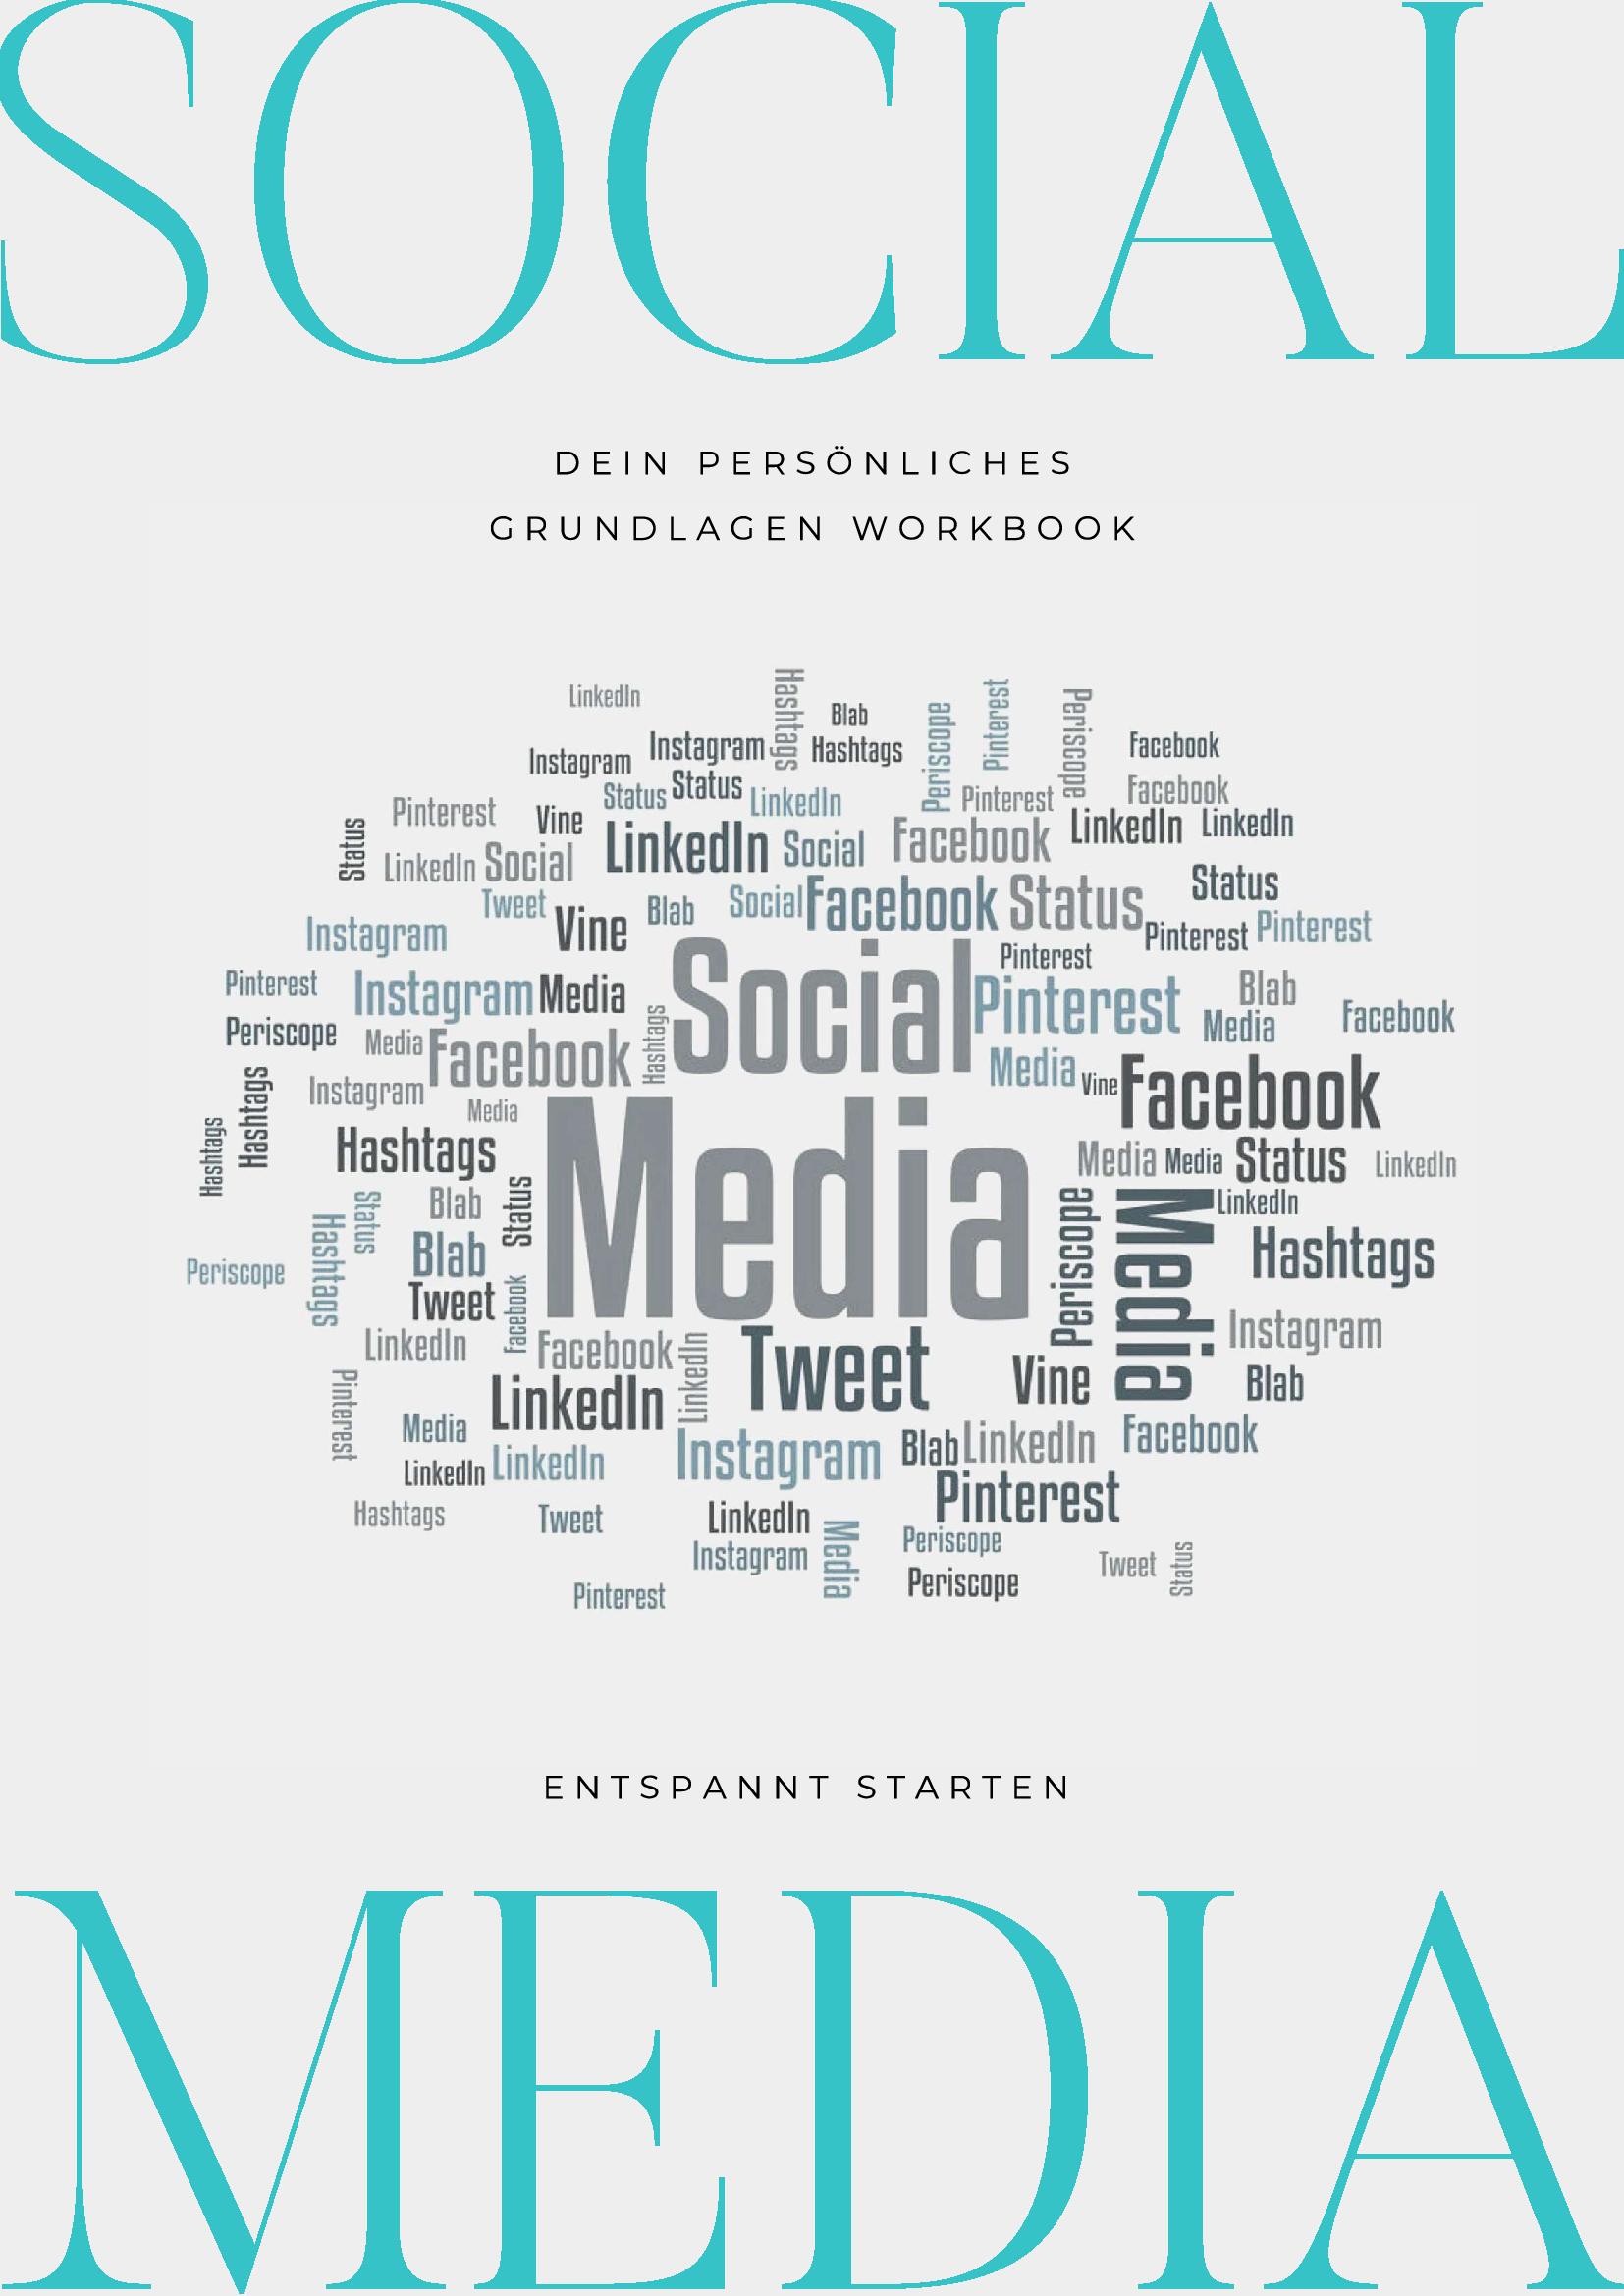 Social Media Workbook Cover